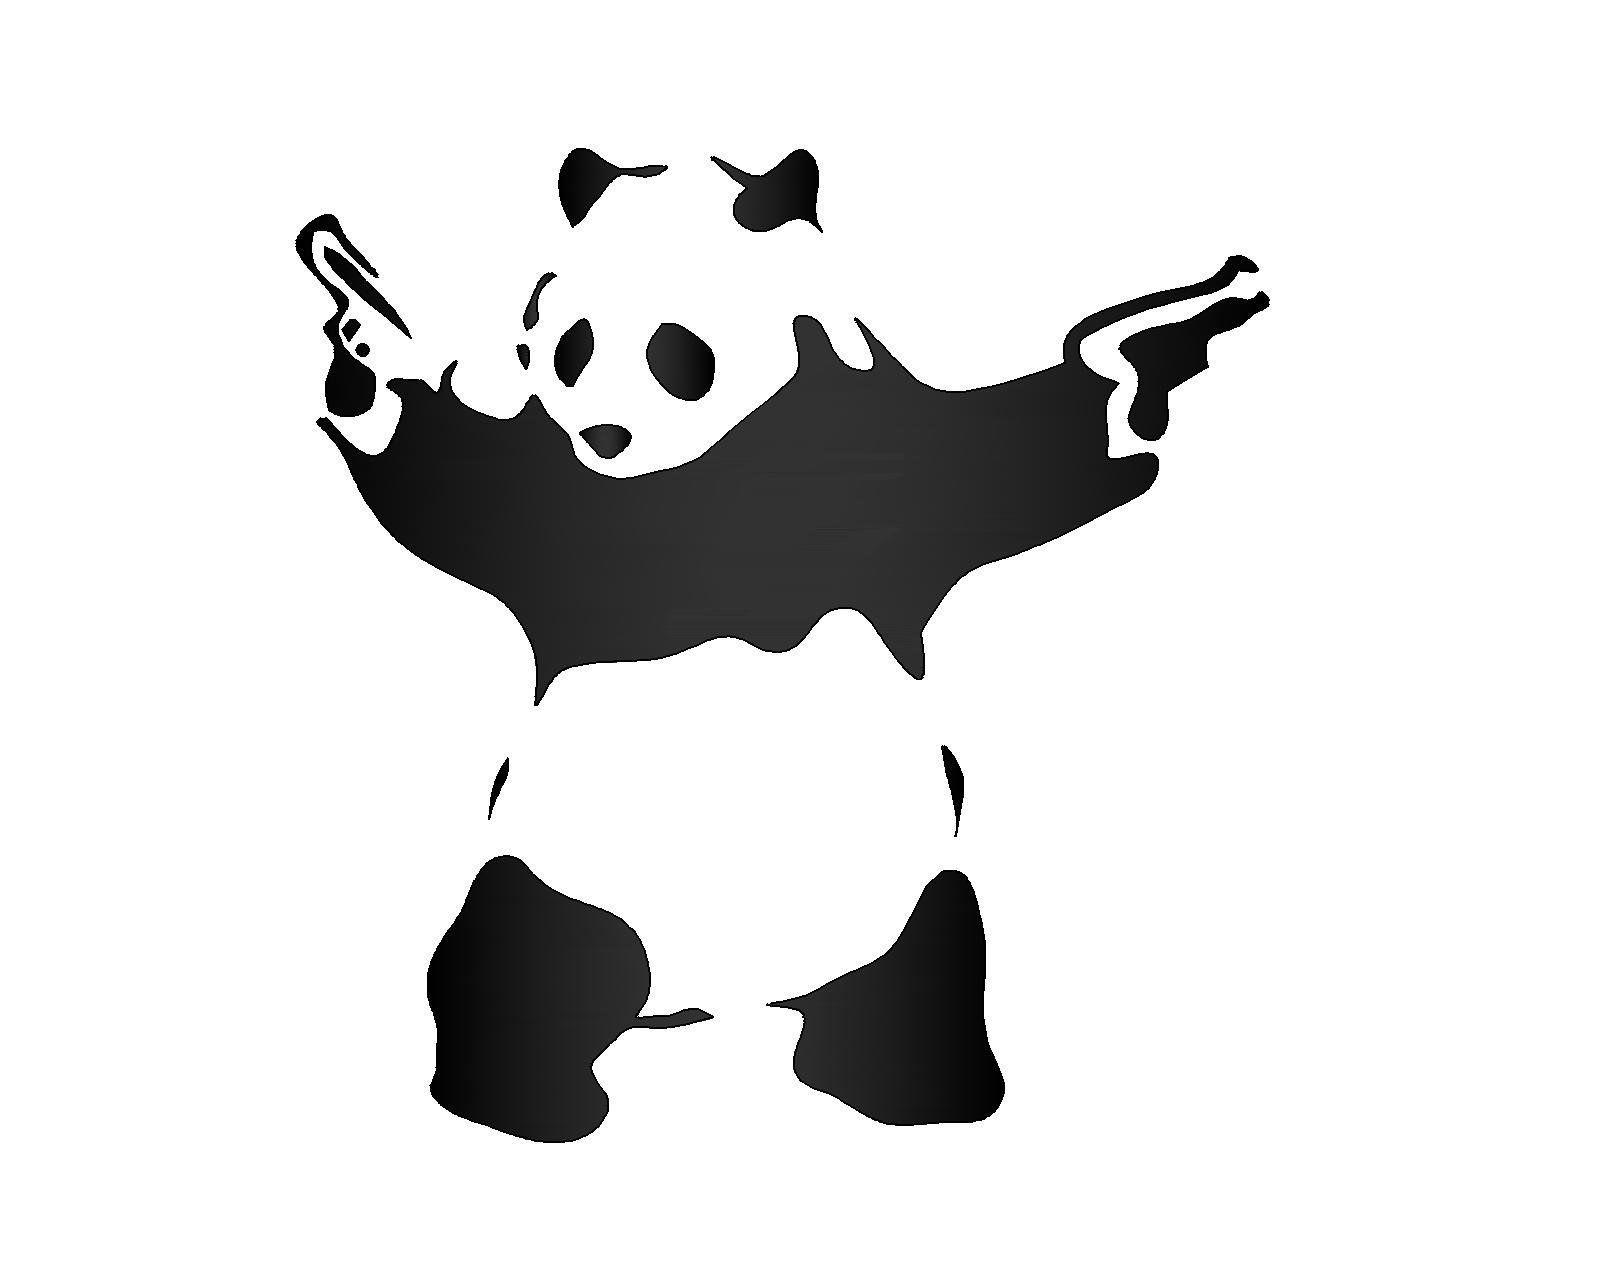 Image Result For Panda Shooting Guns Wallpaper Guns Wallpaper Wallpaper Shooting Guns